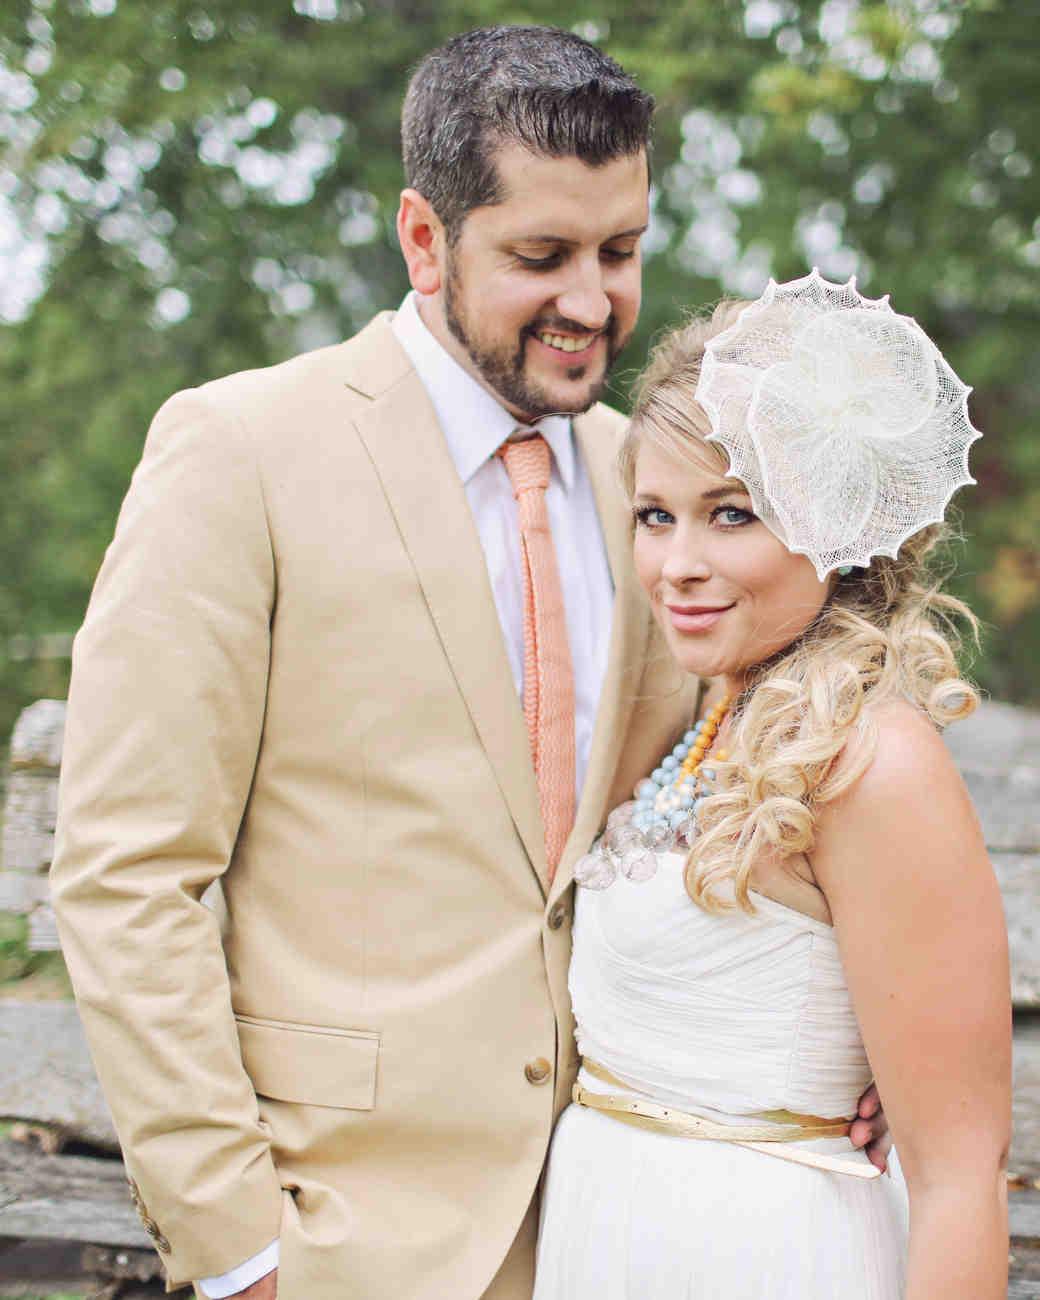 A Whimsical, Casual DIY Wedding In A Barn In Idaho